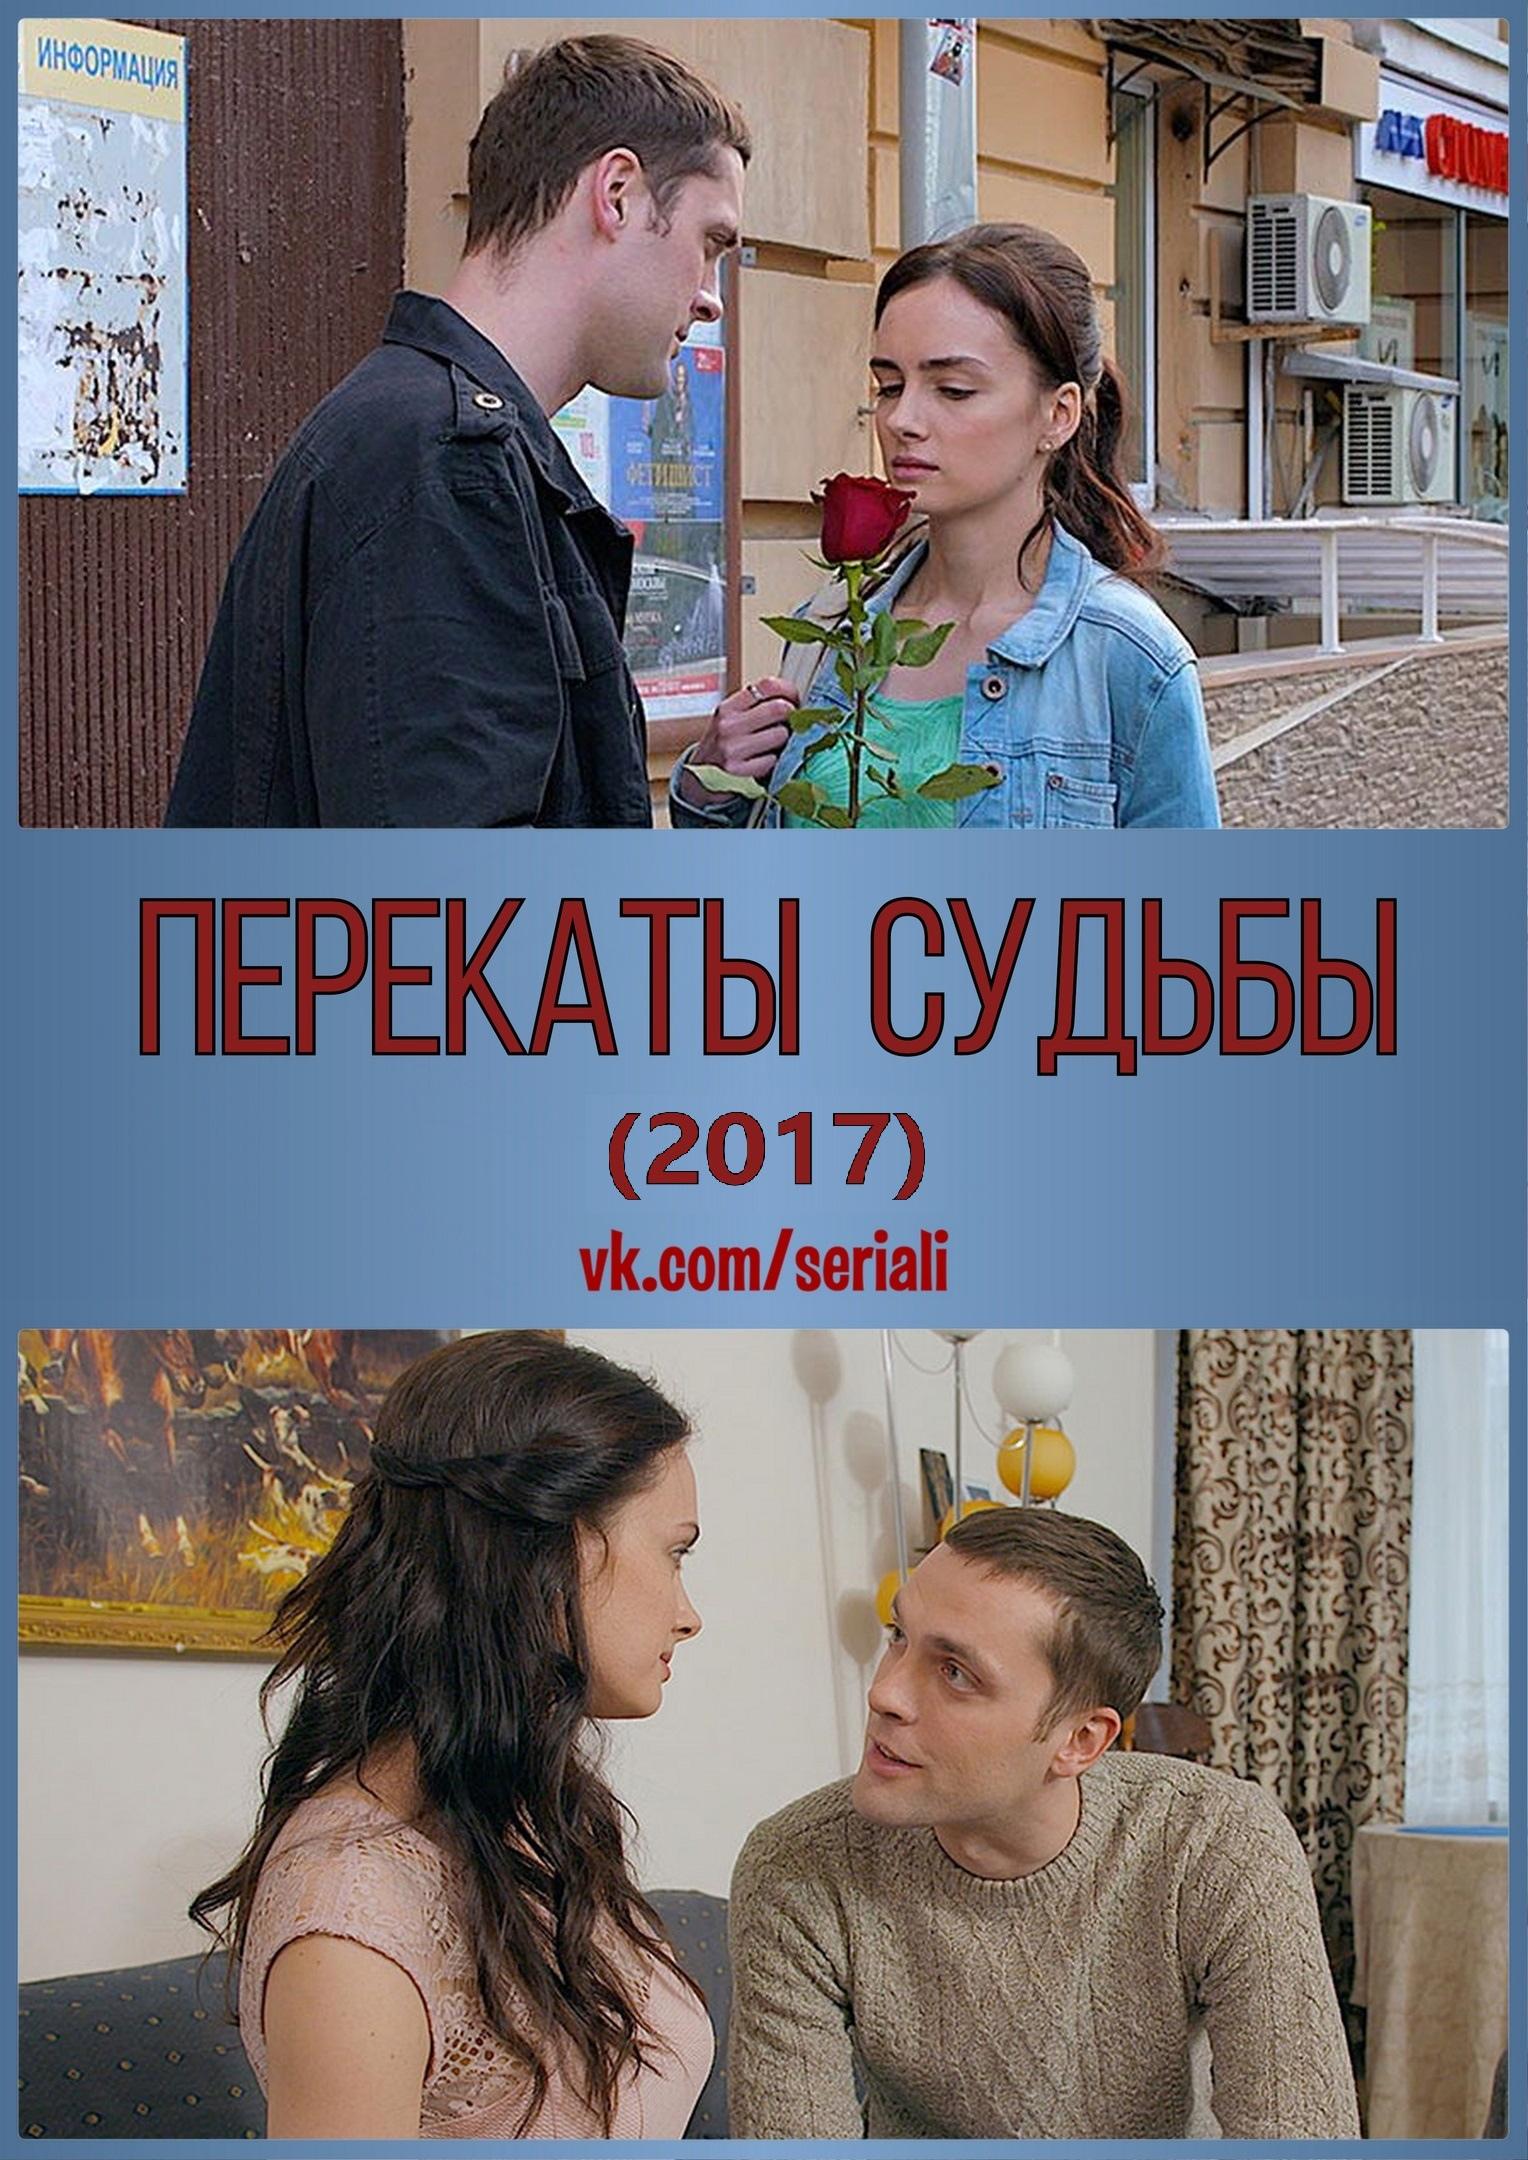 Мелодрама «Пepeкaты cyдьбы» (2017) 1-4 серия из 4 HD